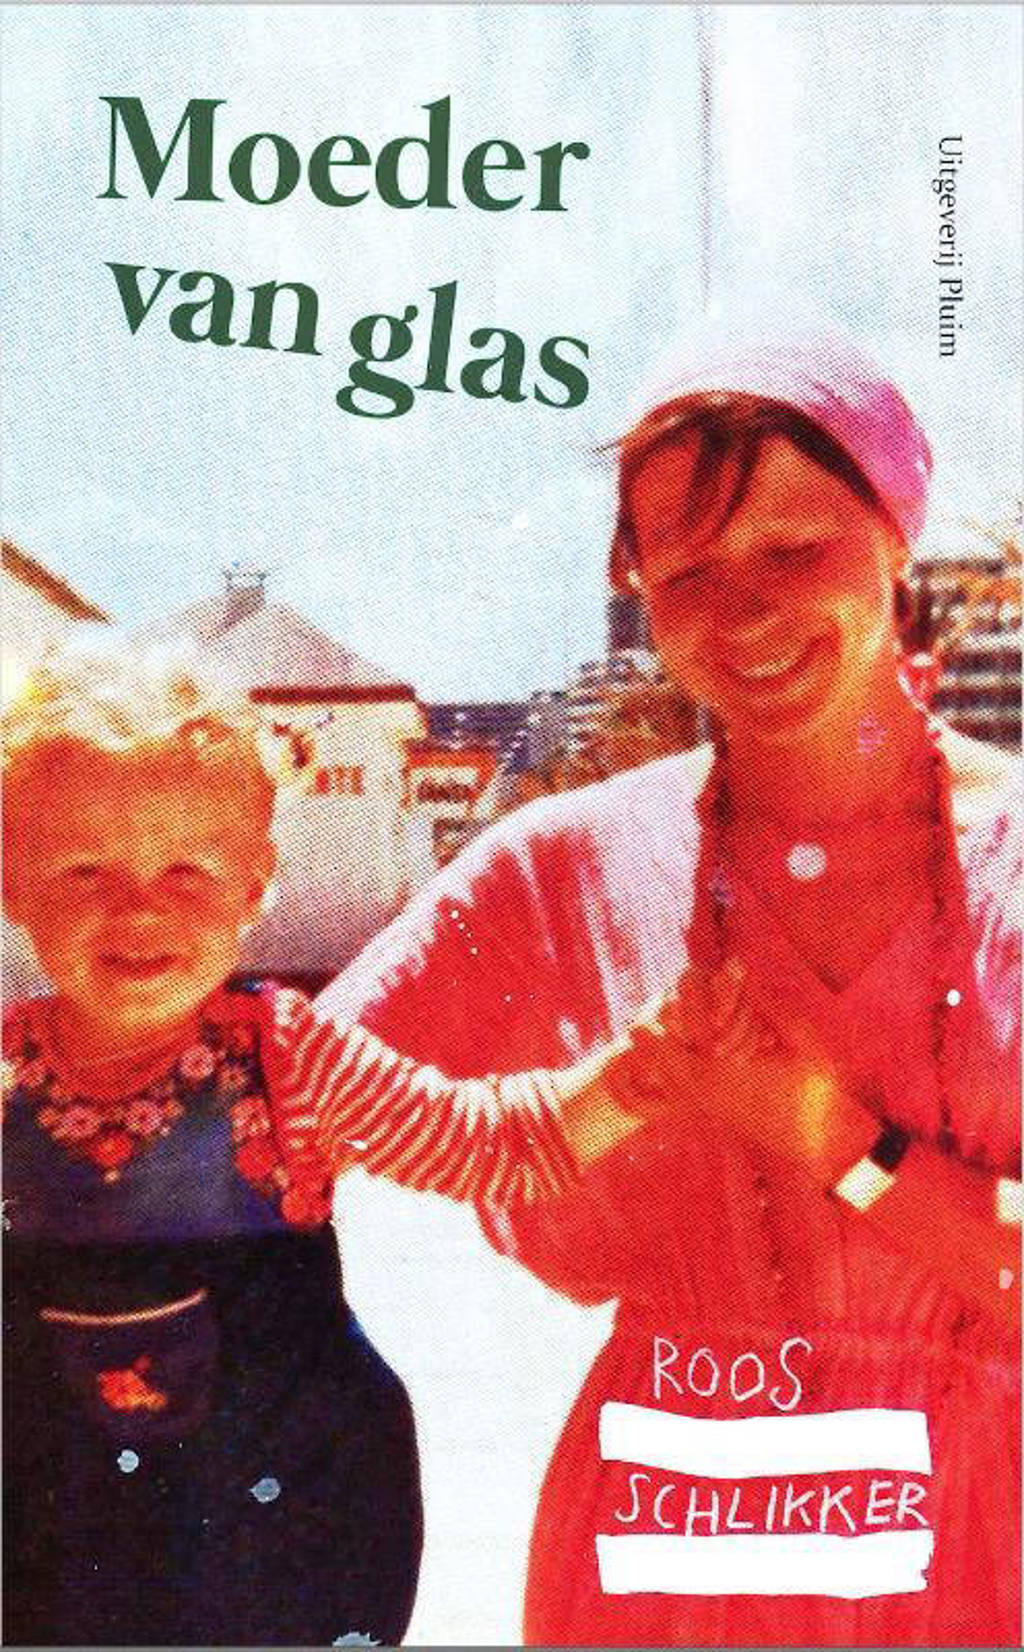 Moeder van glas - Roos Schlikker